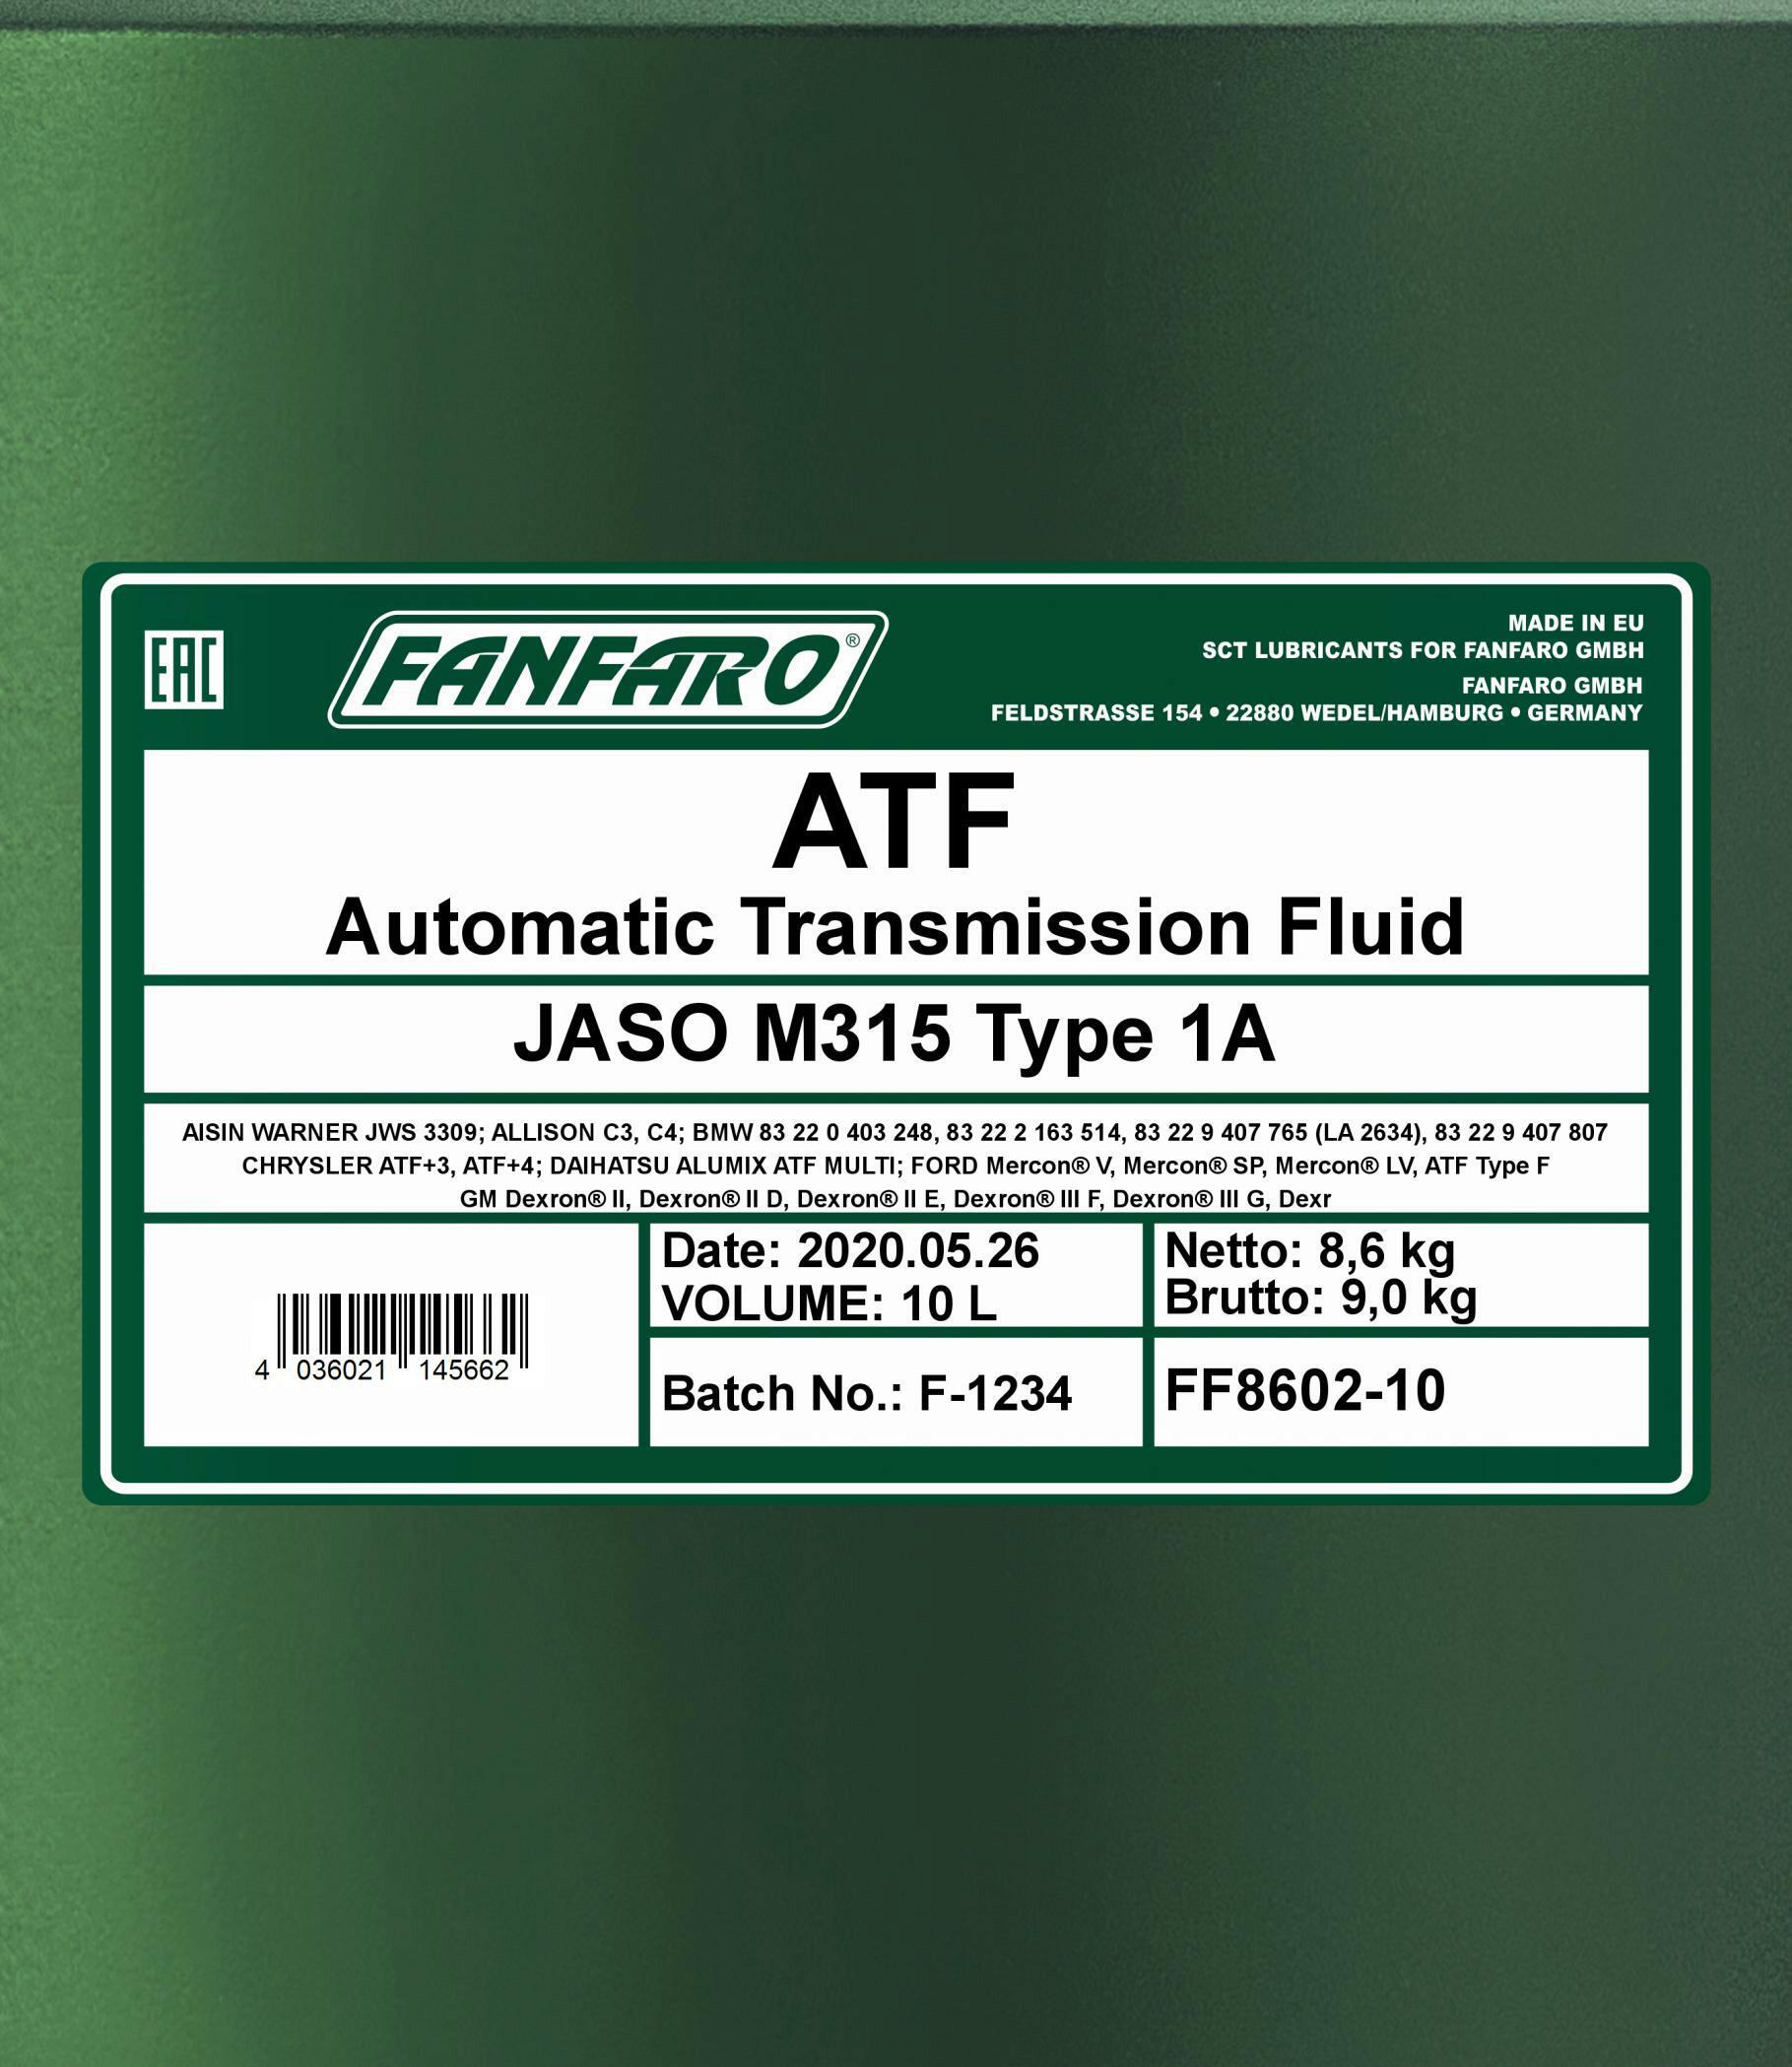 10L FANFARO ATF Getriebeöl Universal